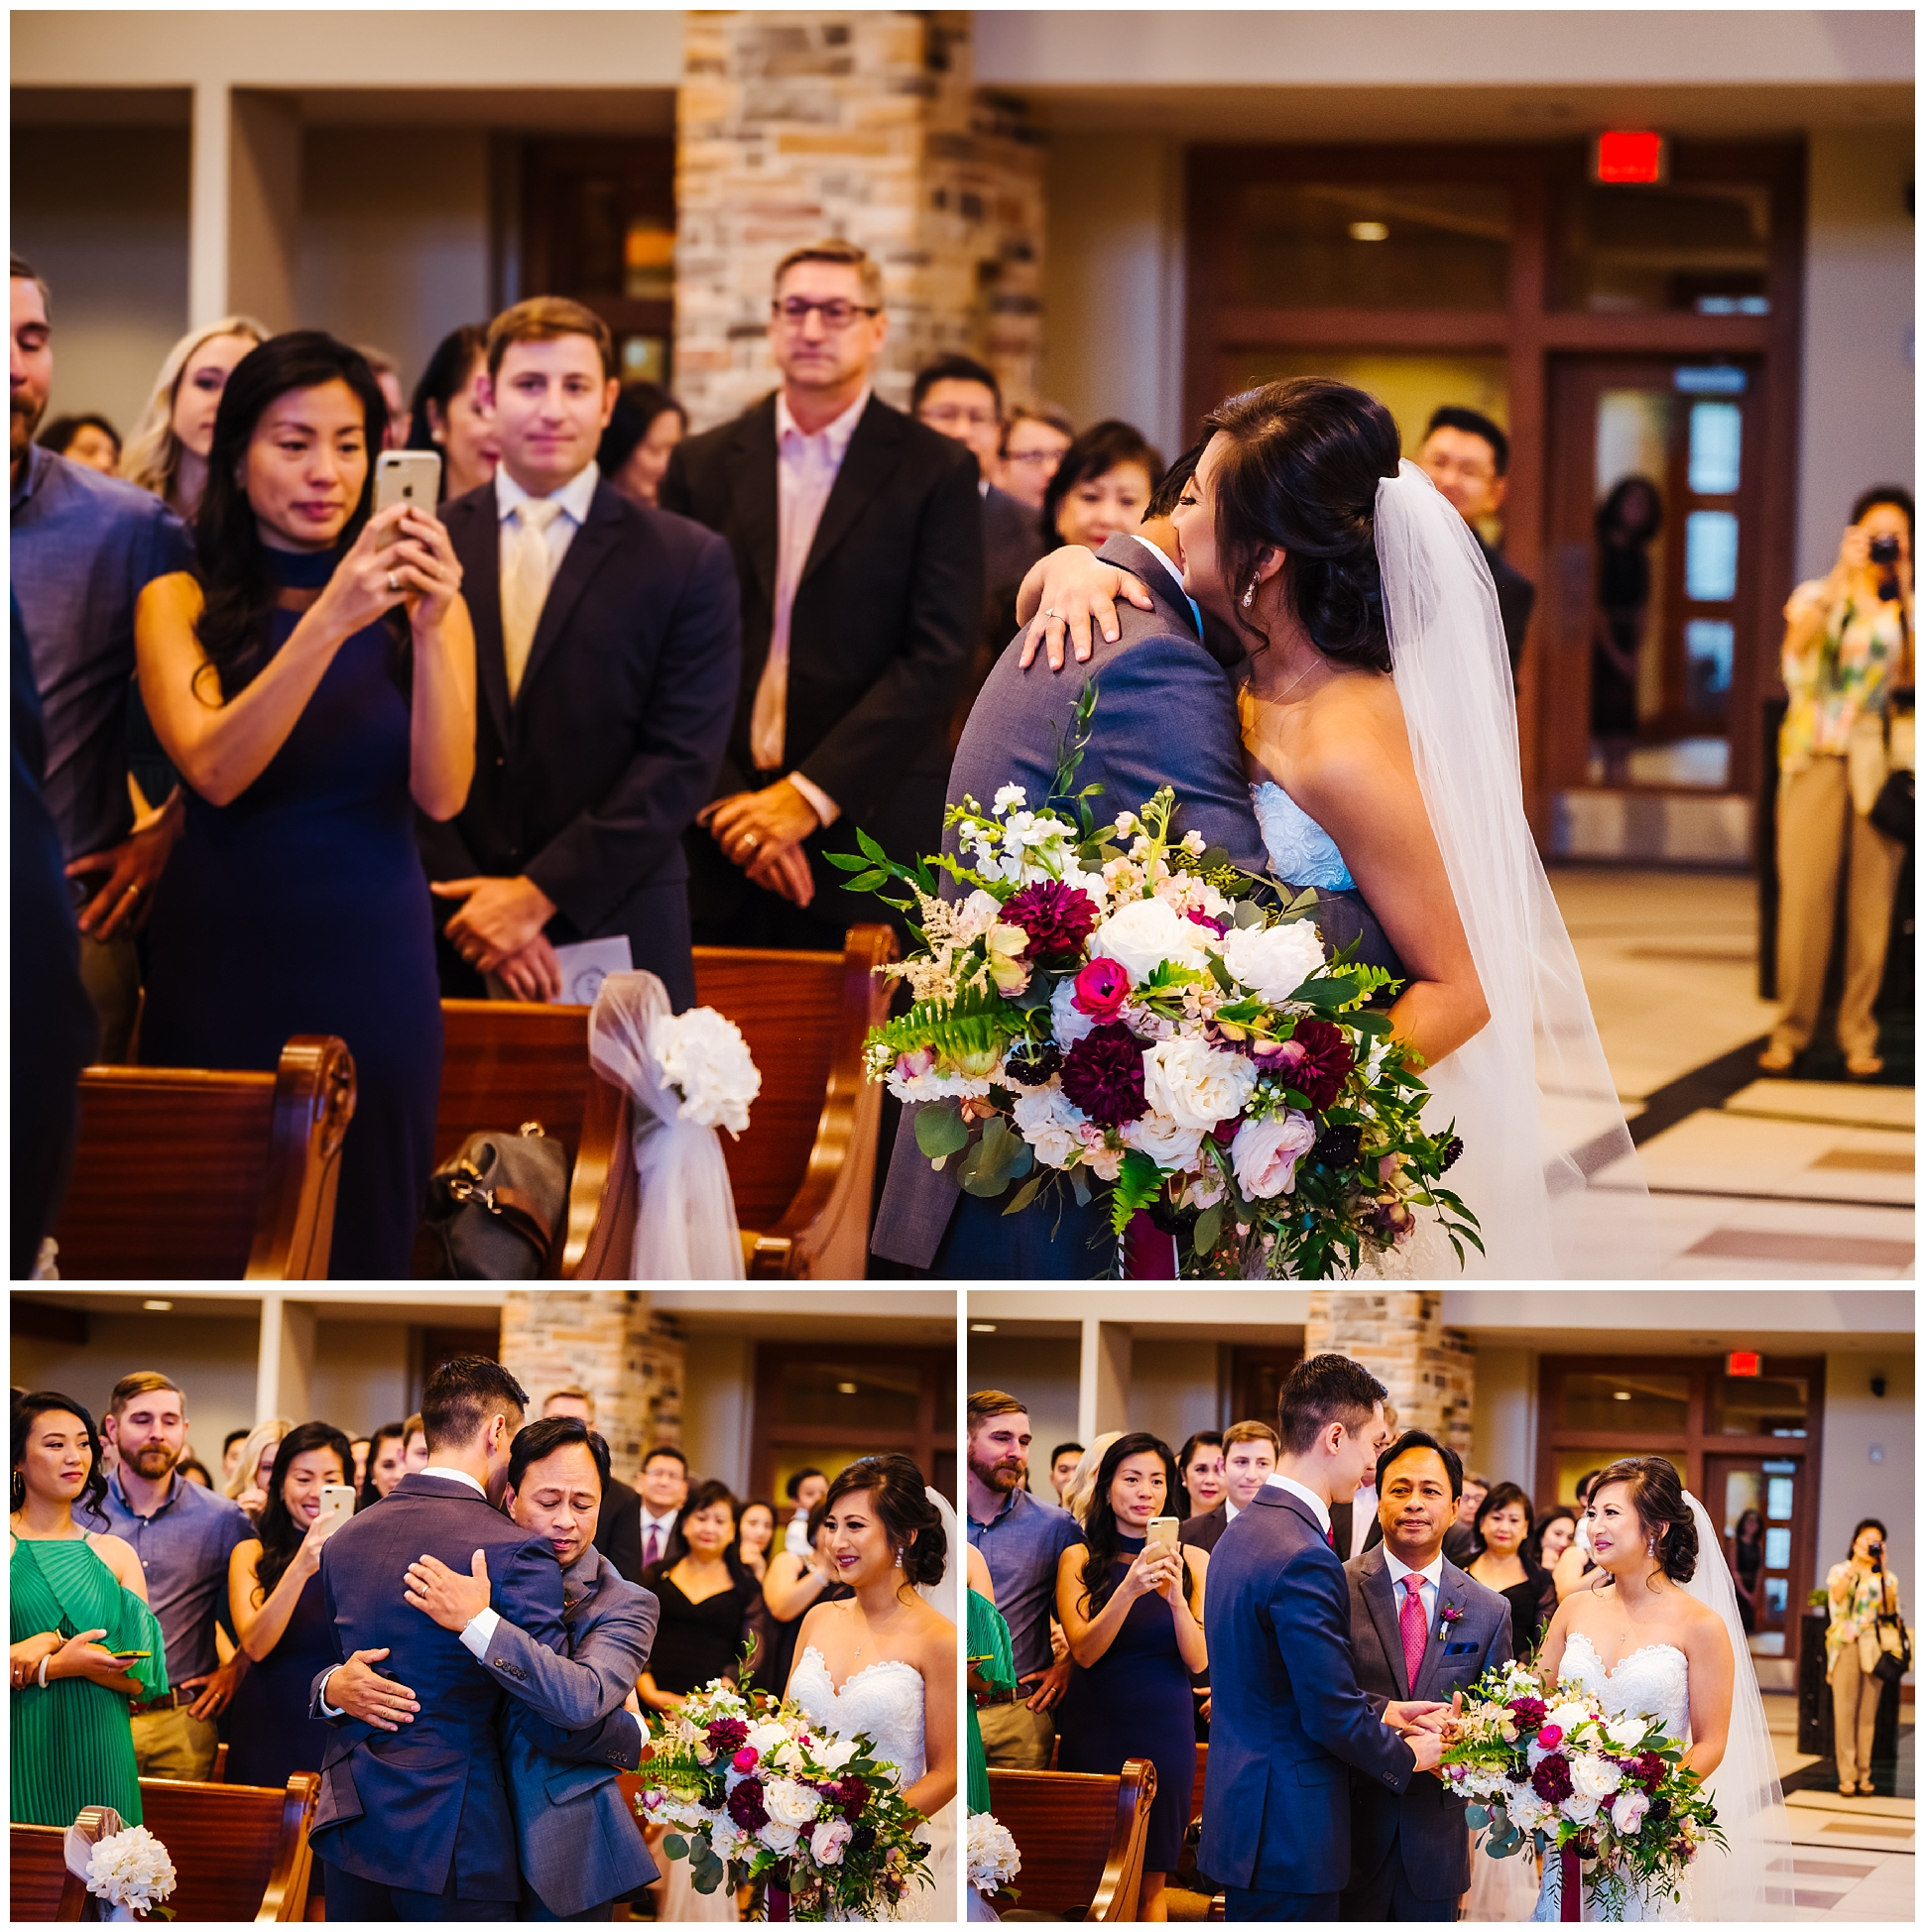 tampa-wedding-photographer-philipino-colorful-woods-ballroom-church-mass-confetti-fuscia_0030.jpg